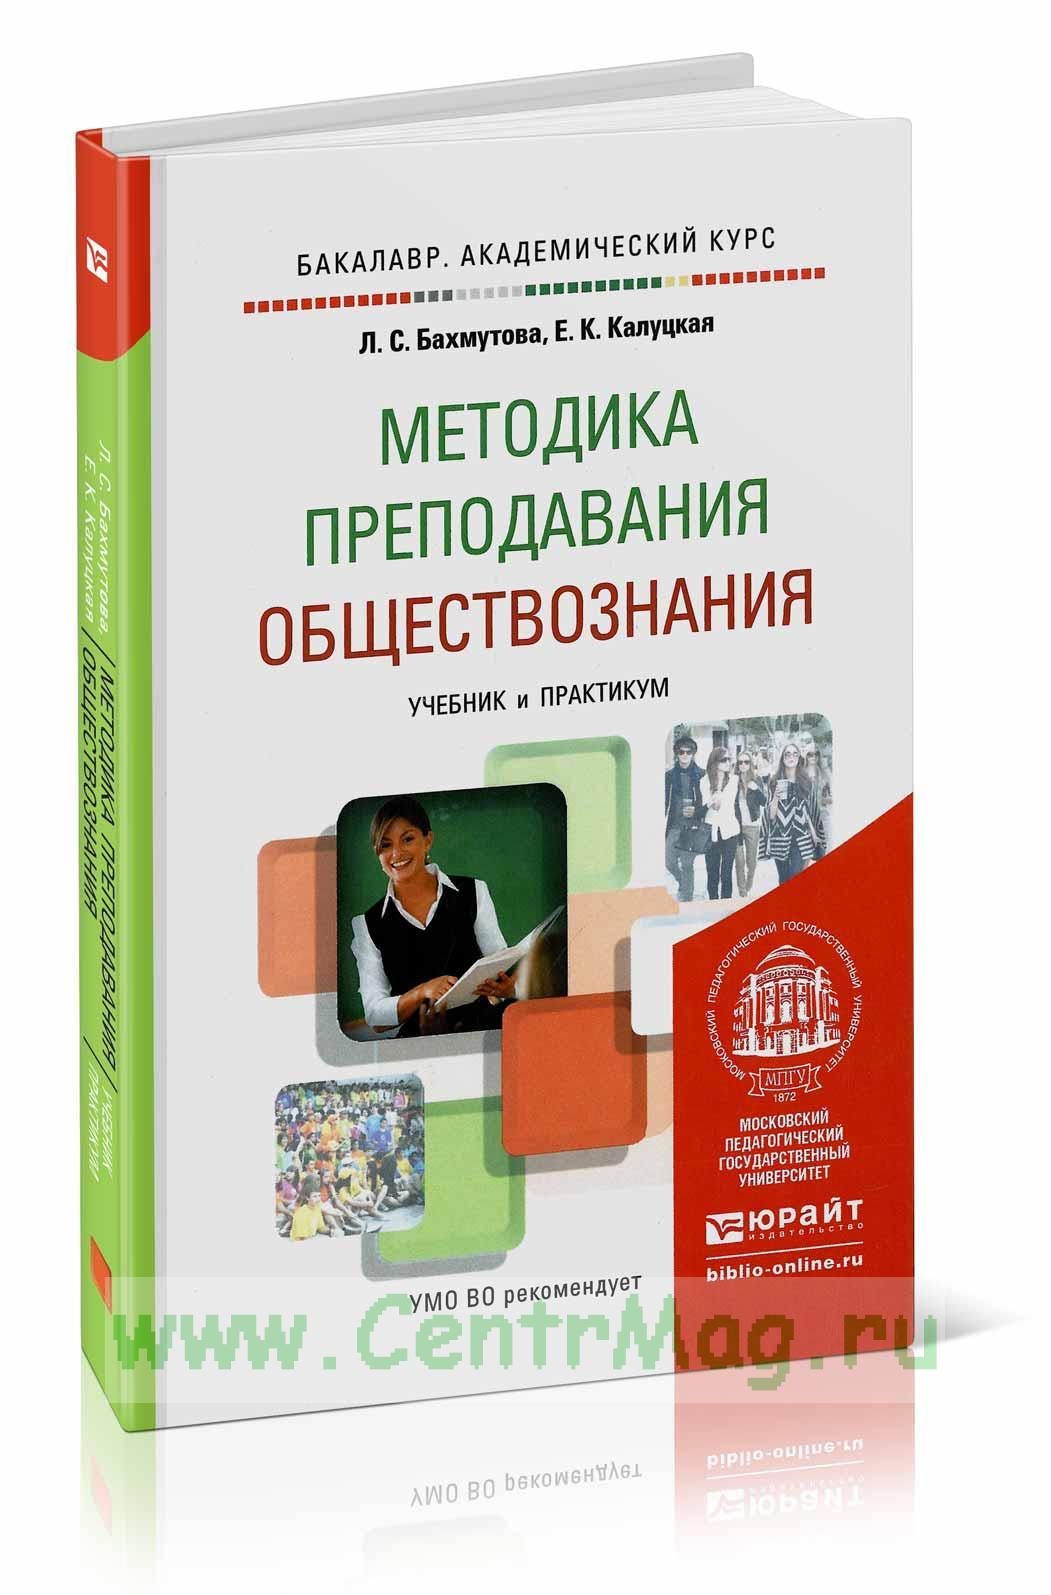 Методика преподавания обществознания: учебник и практикум для академического бакалавриата